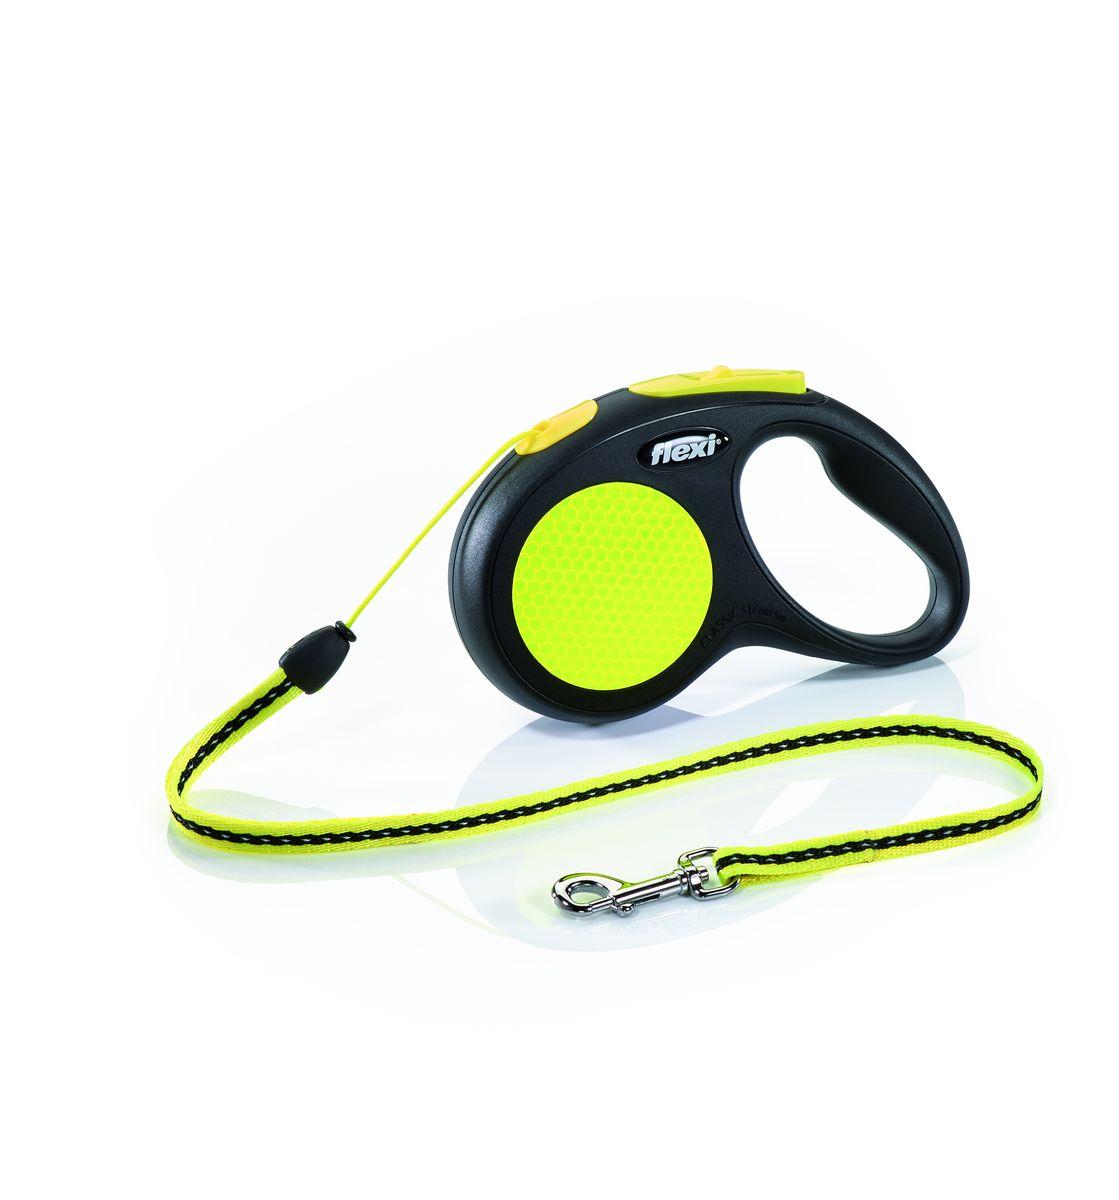 Поводок-рулетка Flexi Neon New Classic S, трос, для собак весом до 12 кг, 5 м короли рулетки